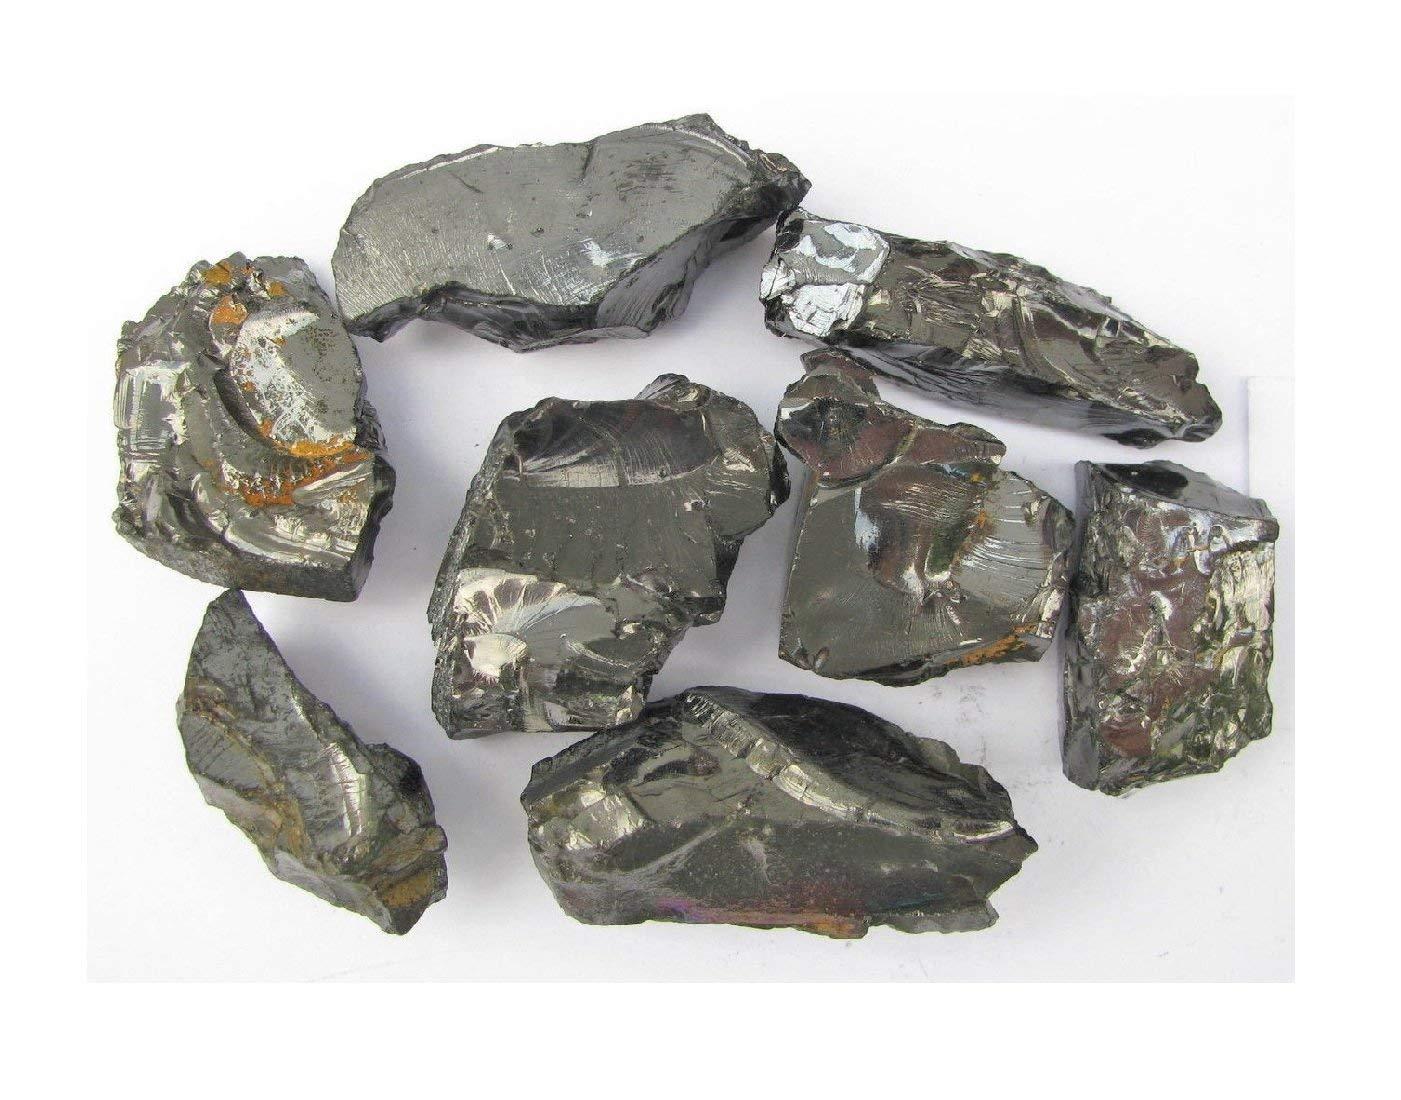 Buy Karelian Heritage: Best Shungite Stones for Water